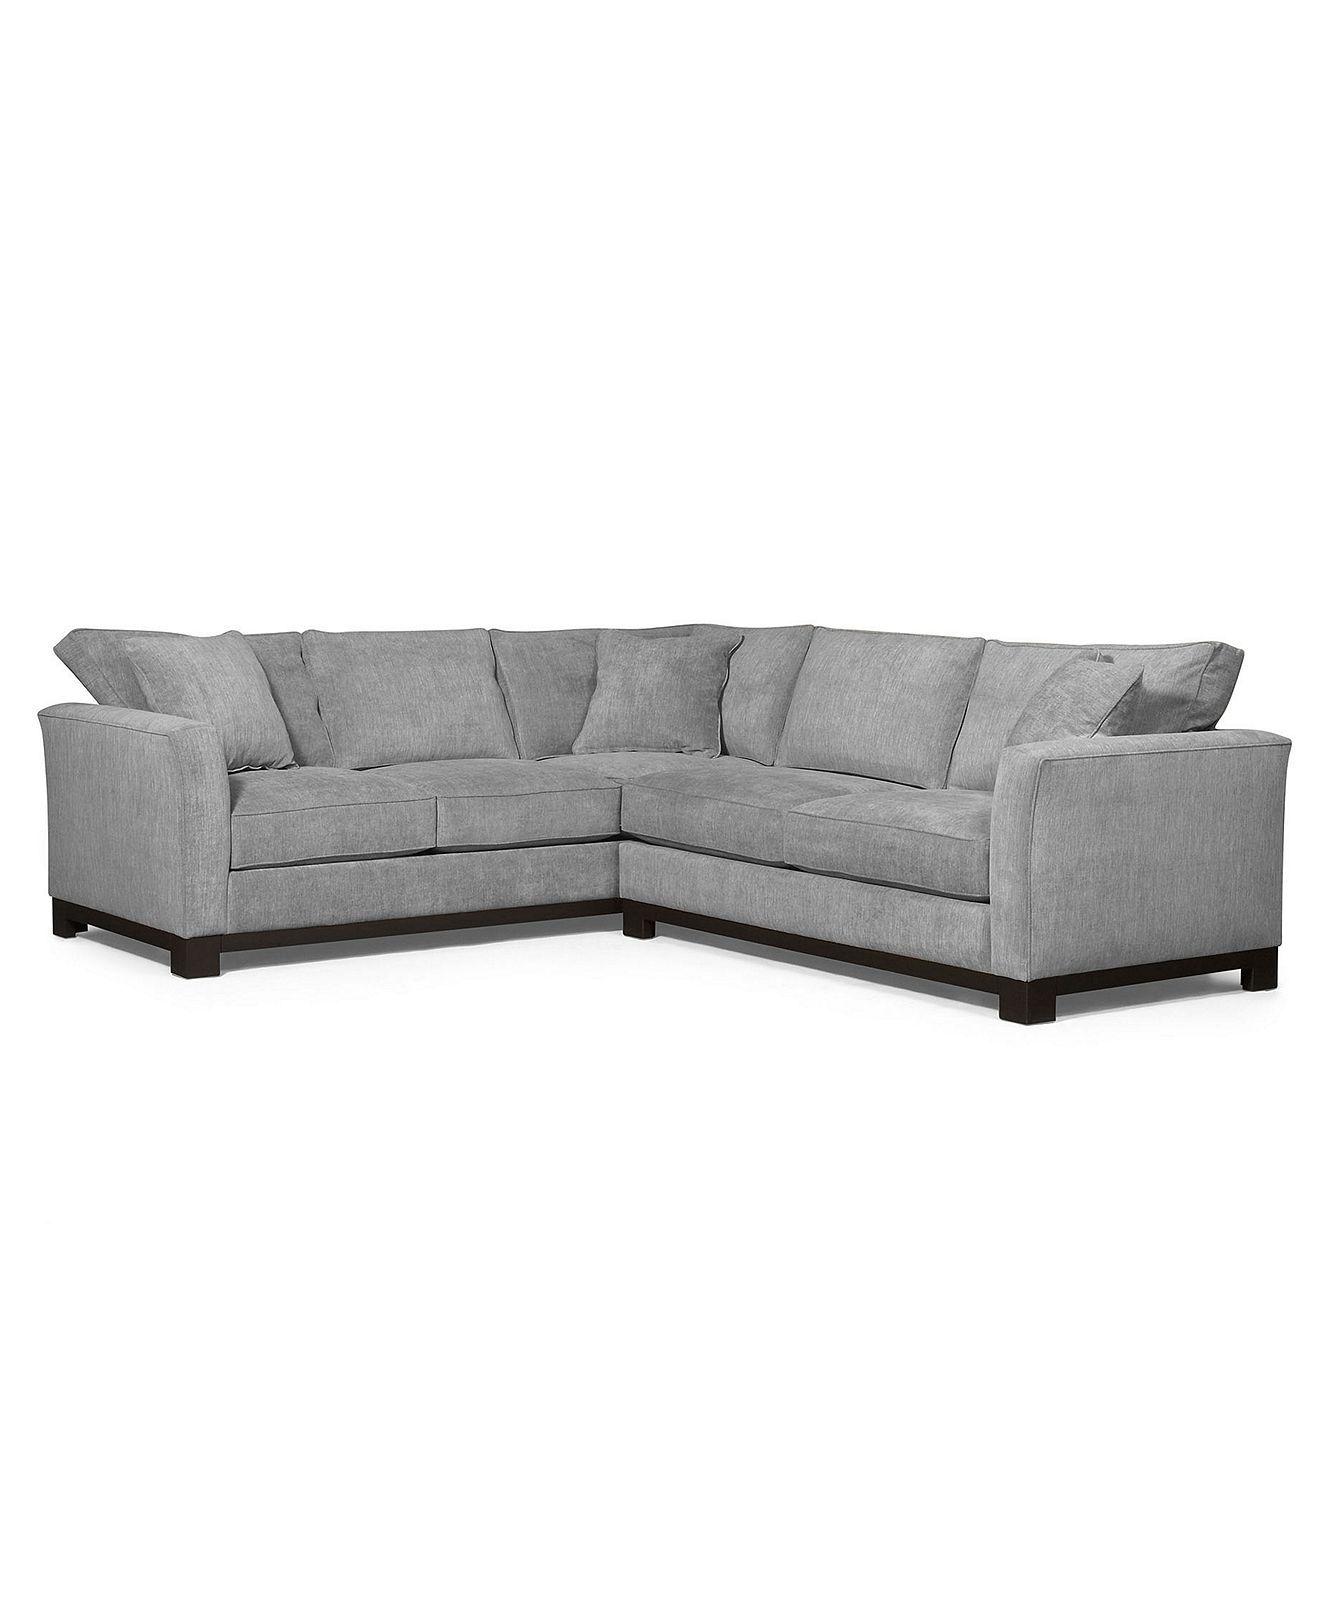 Kenton Fabric Sectional Sofa 2 Piece 107W x 94D x 33H Custom